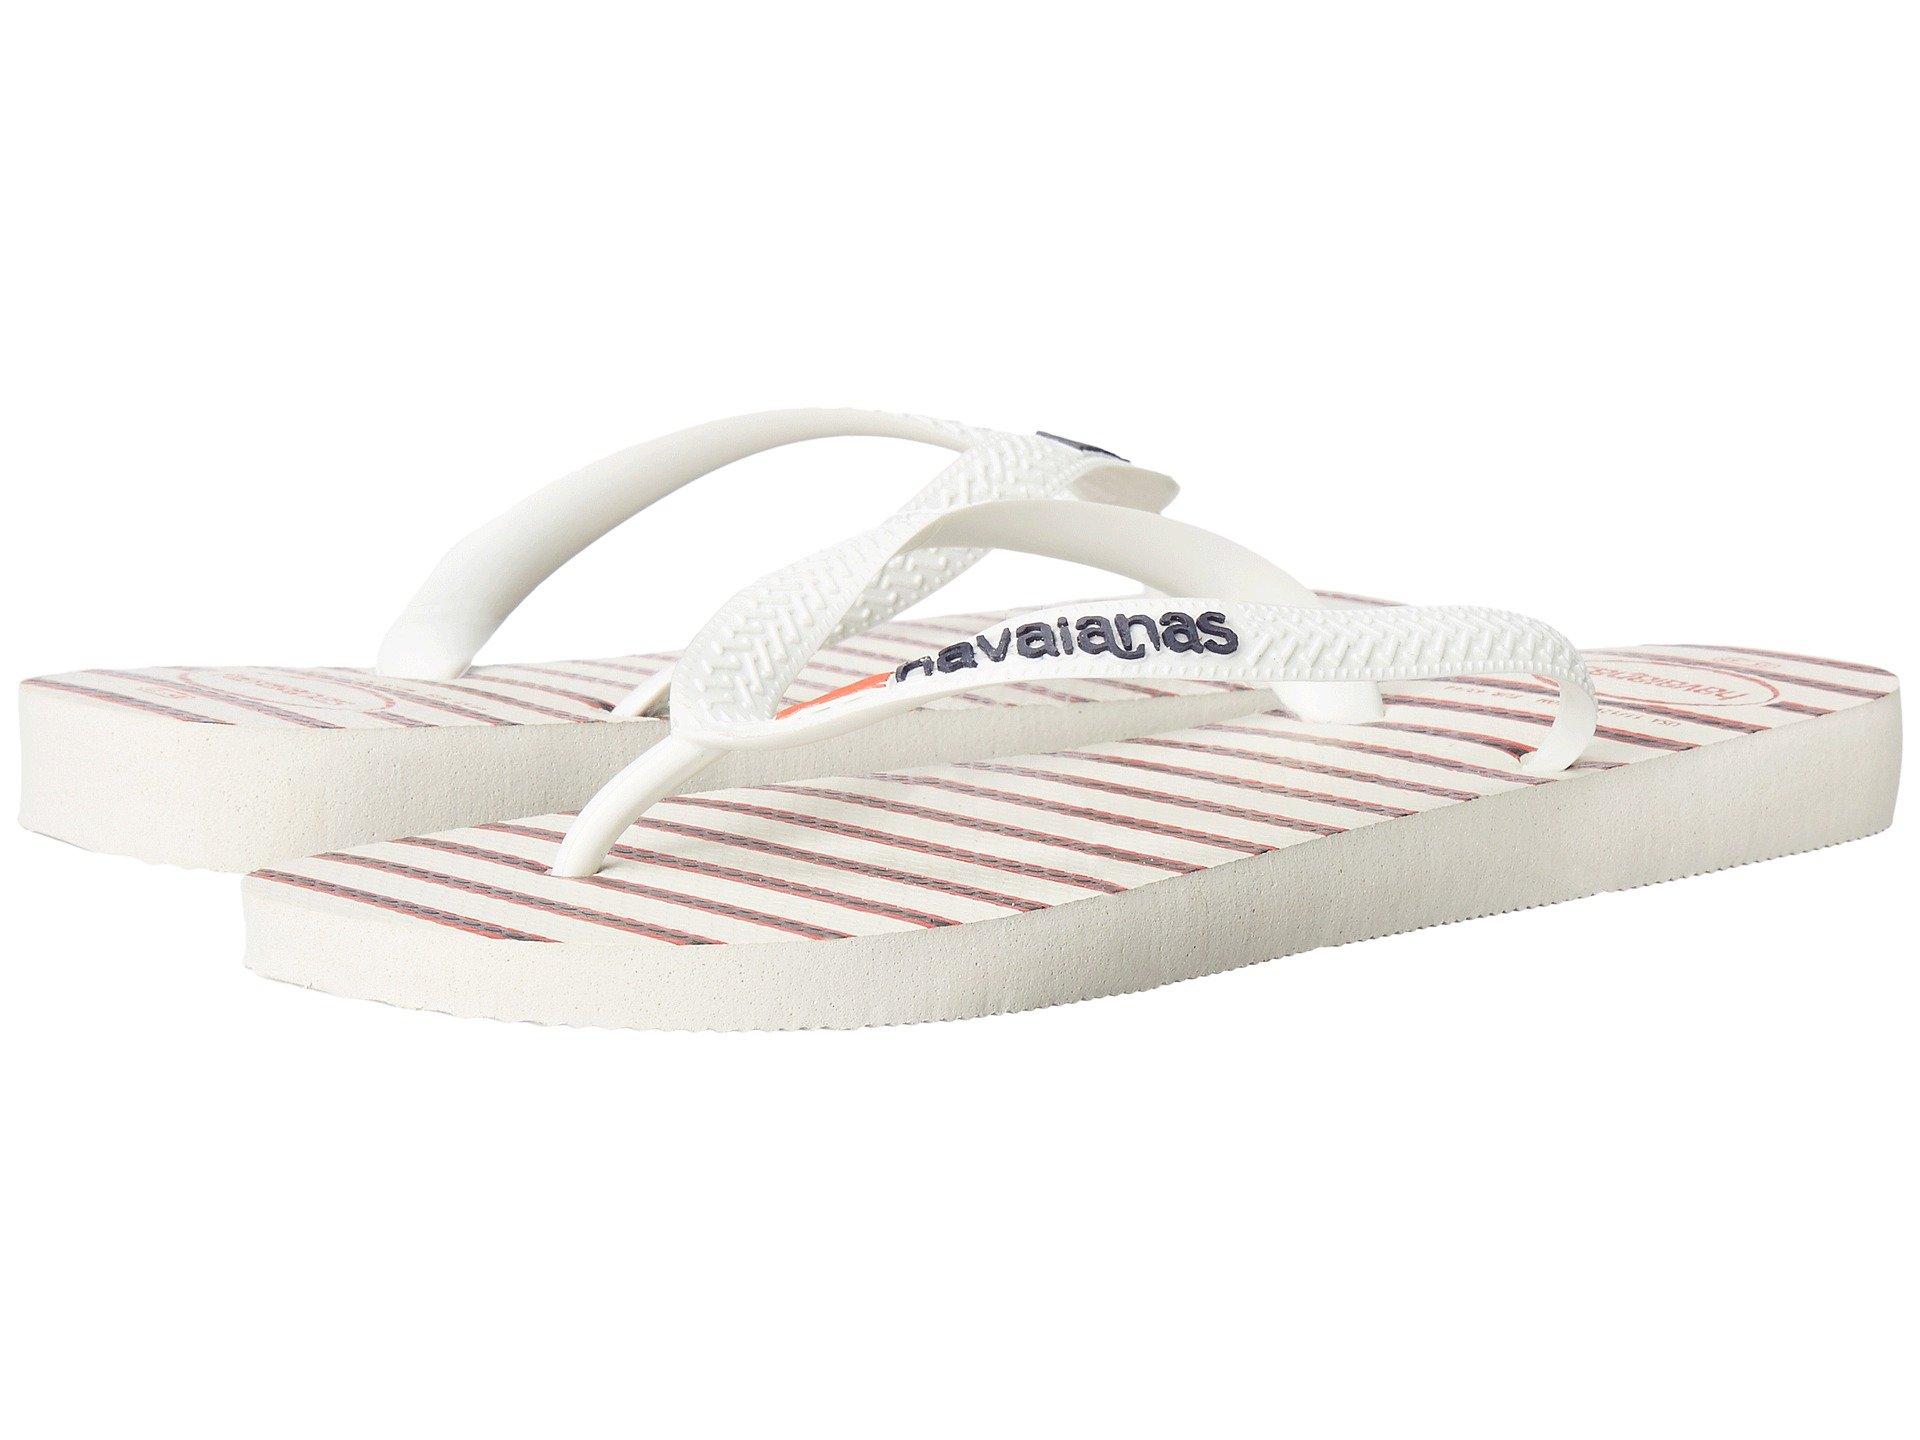 Havaianas Top Americana Sandal bGLQSpXkx8